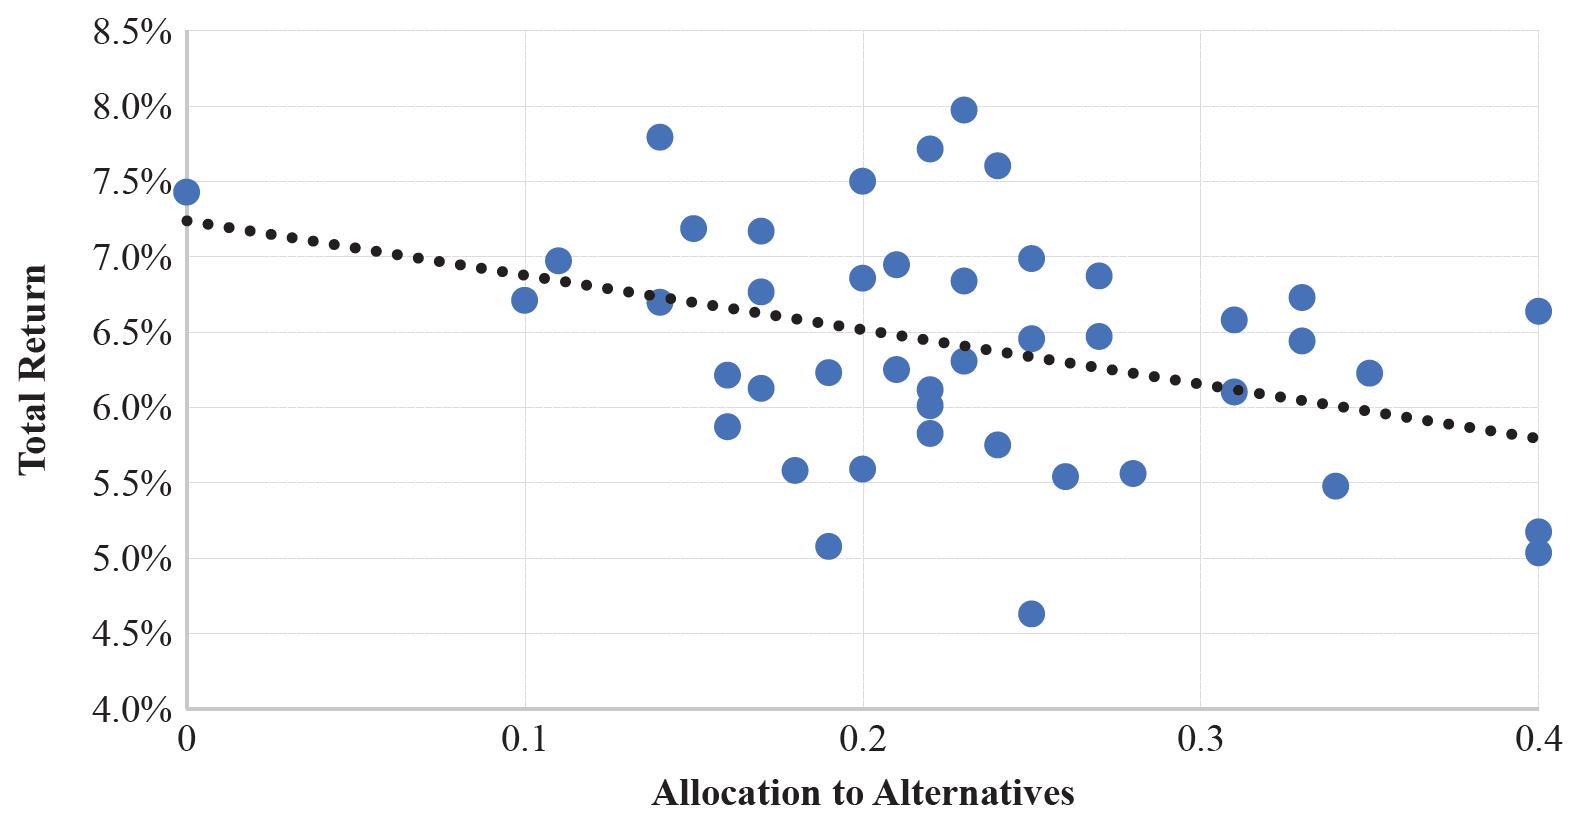 pension funds total return vs. allocation to alternatives